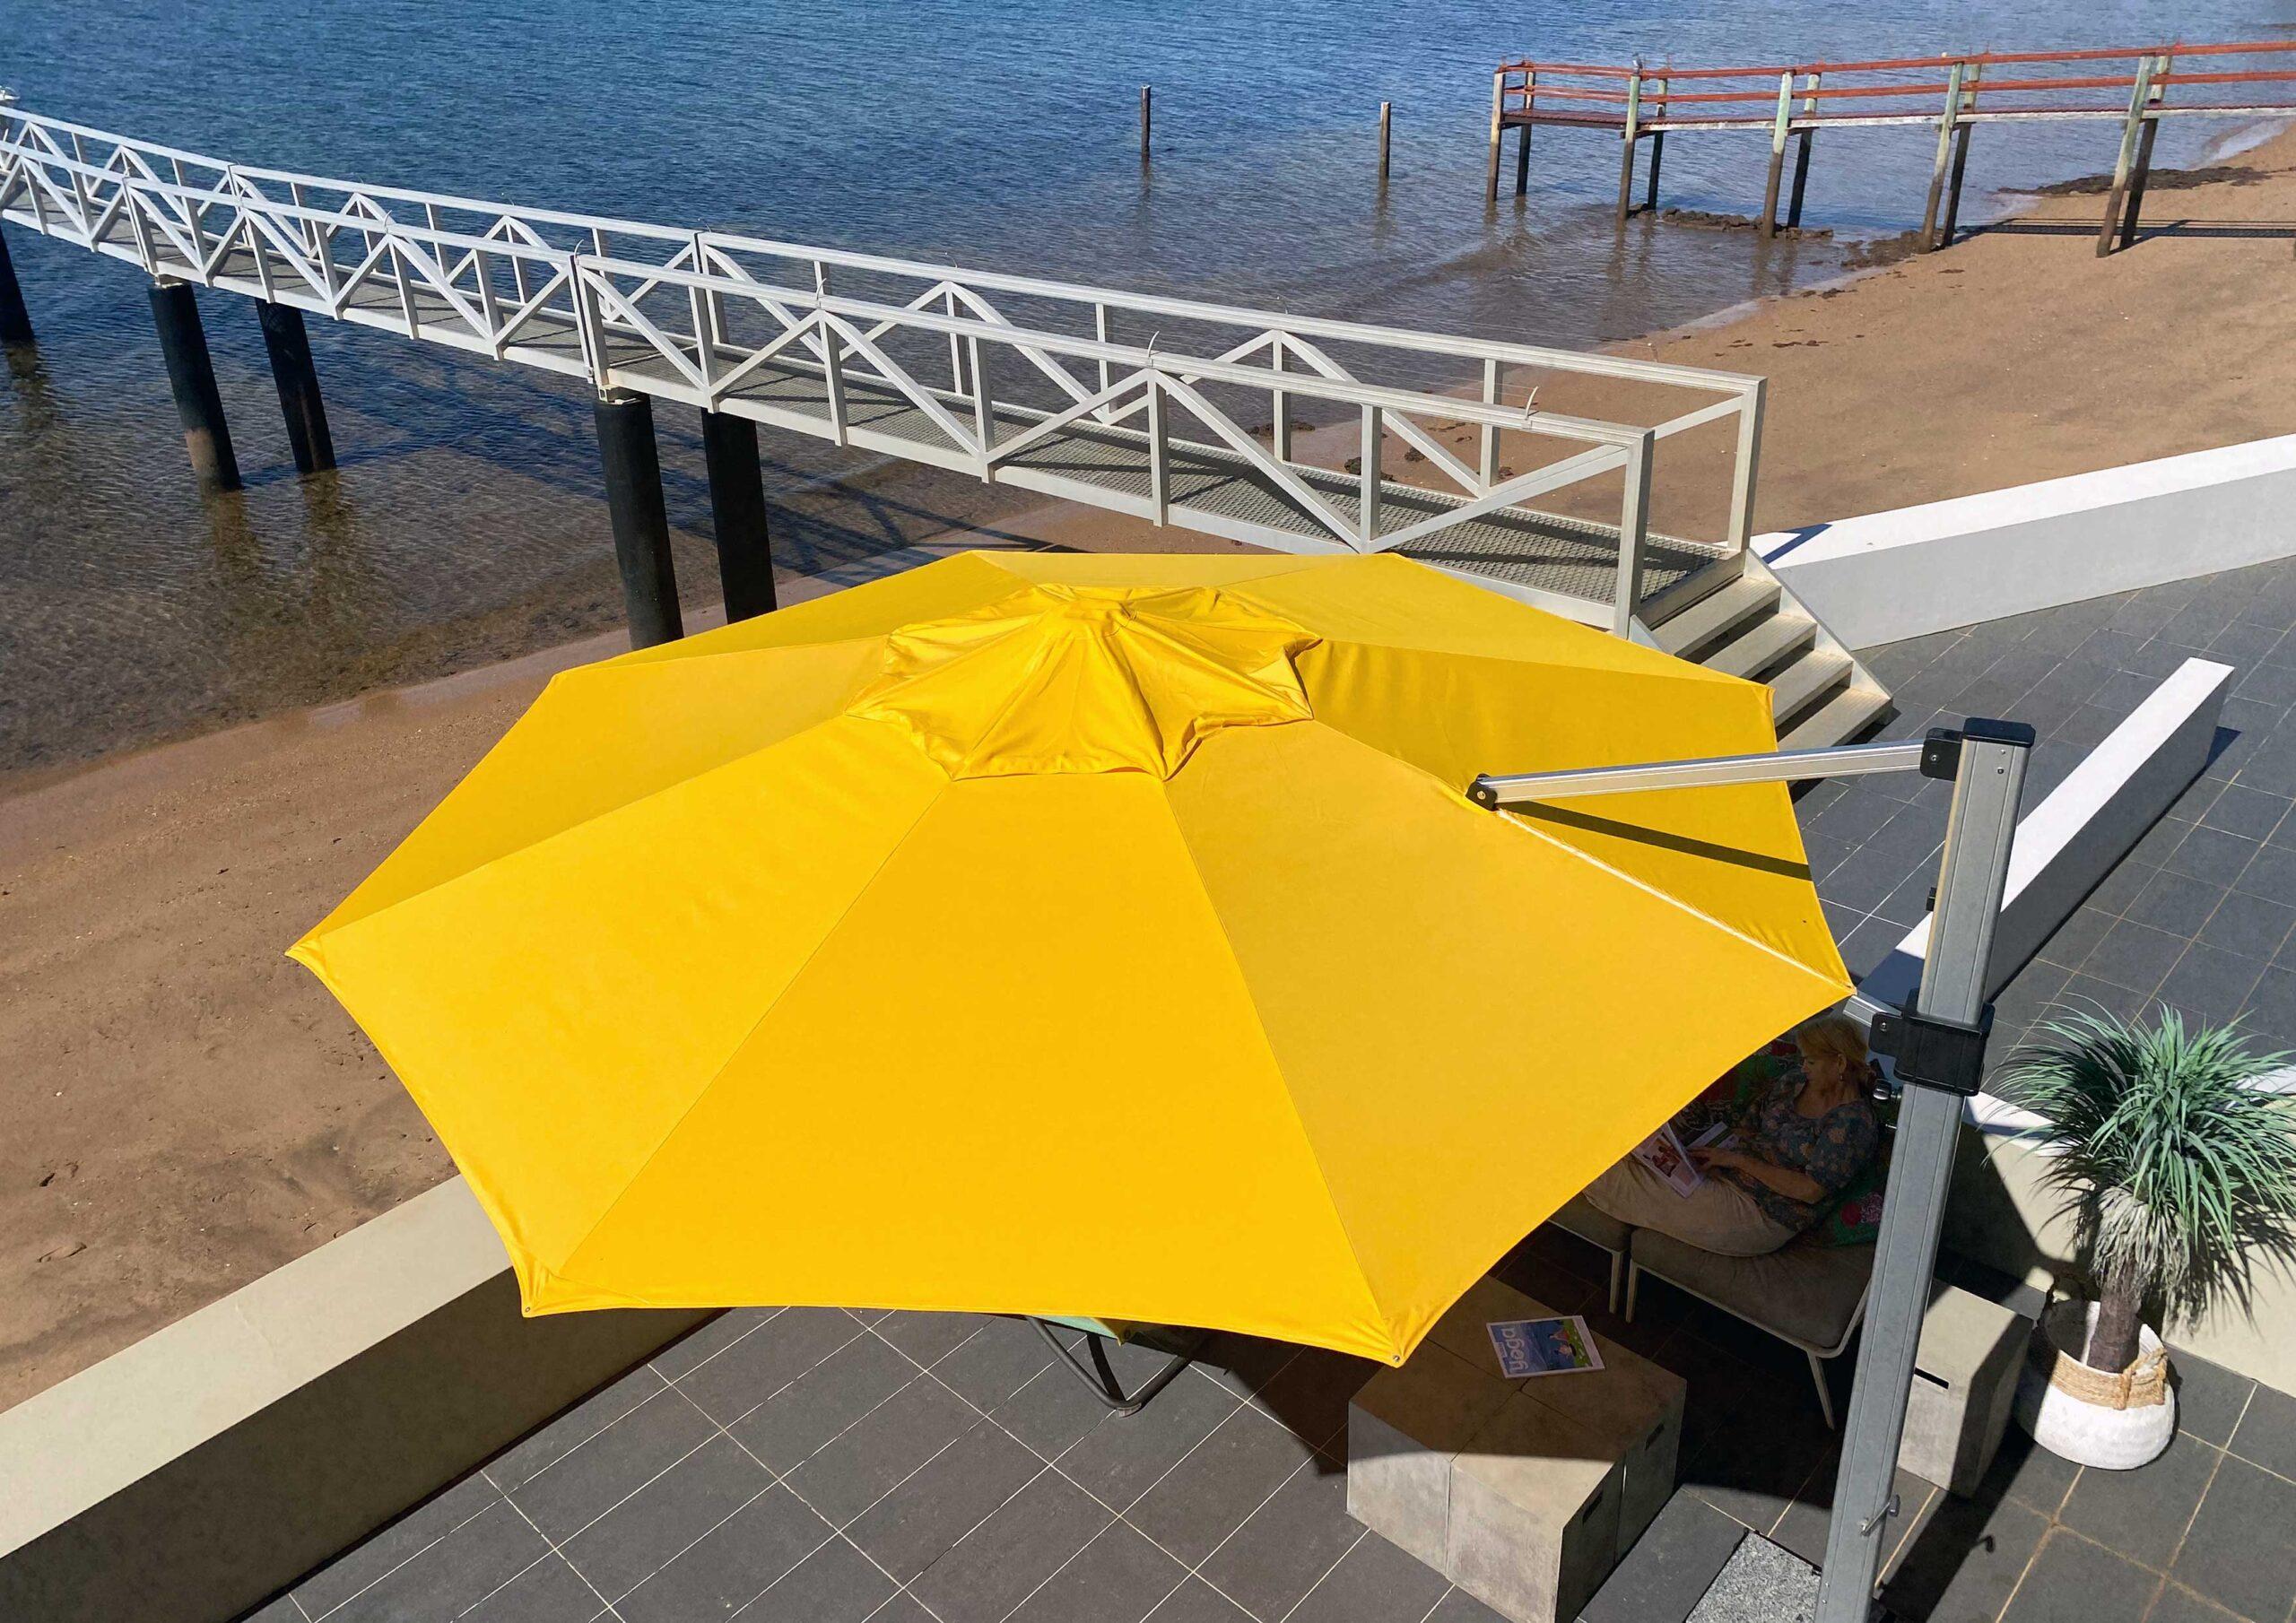 fs gallery images cantilever round octogon umbrella 5